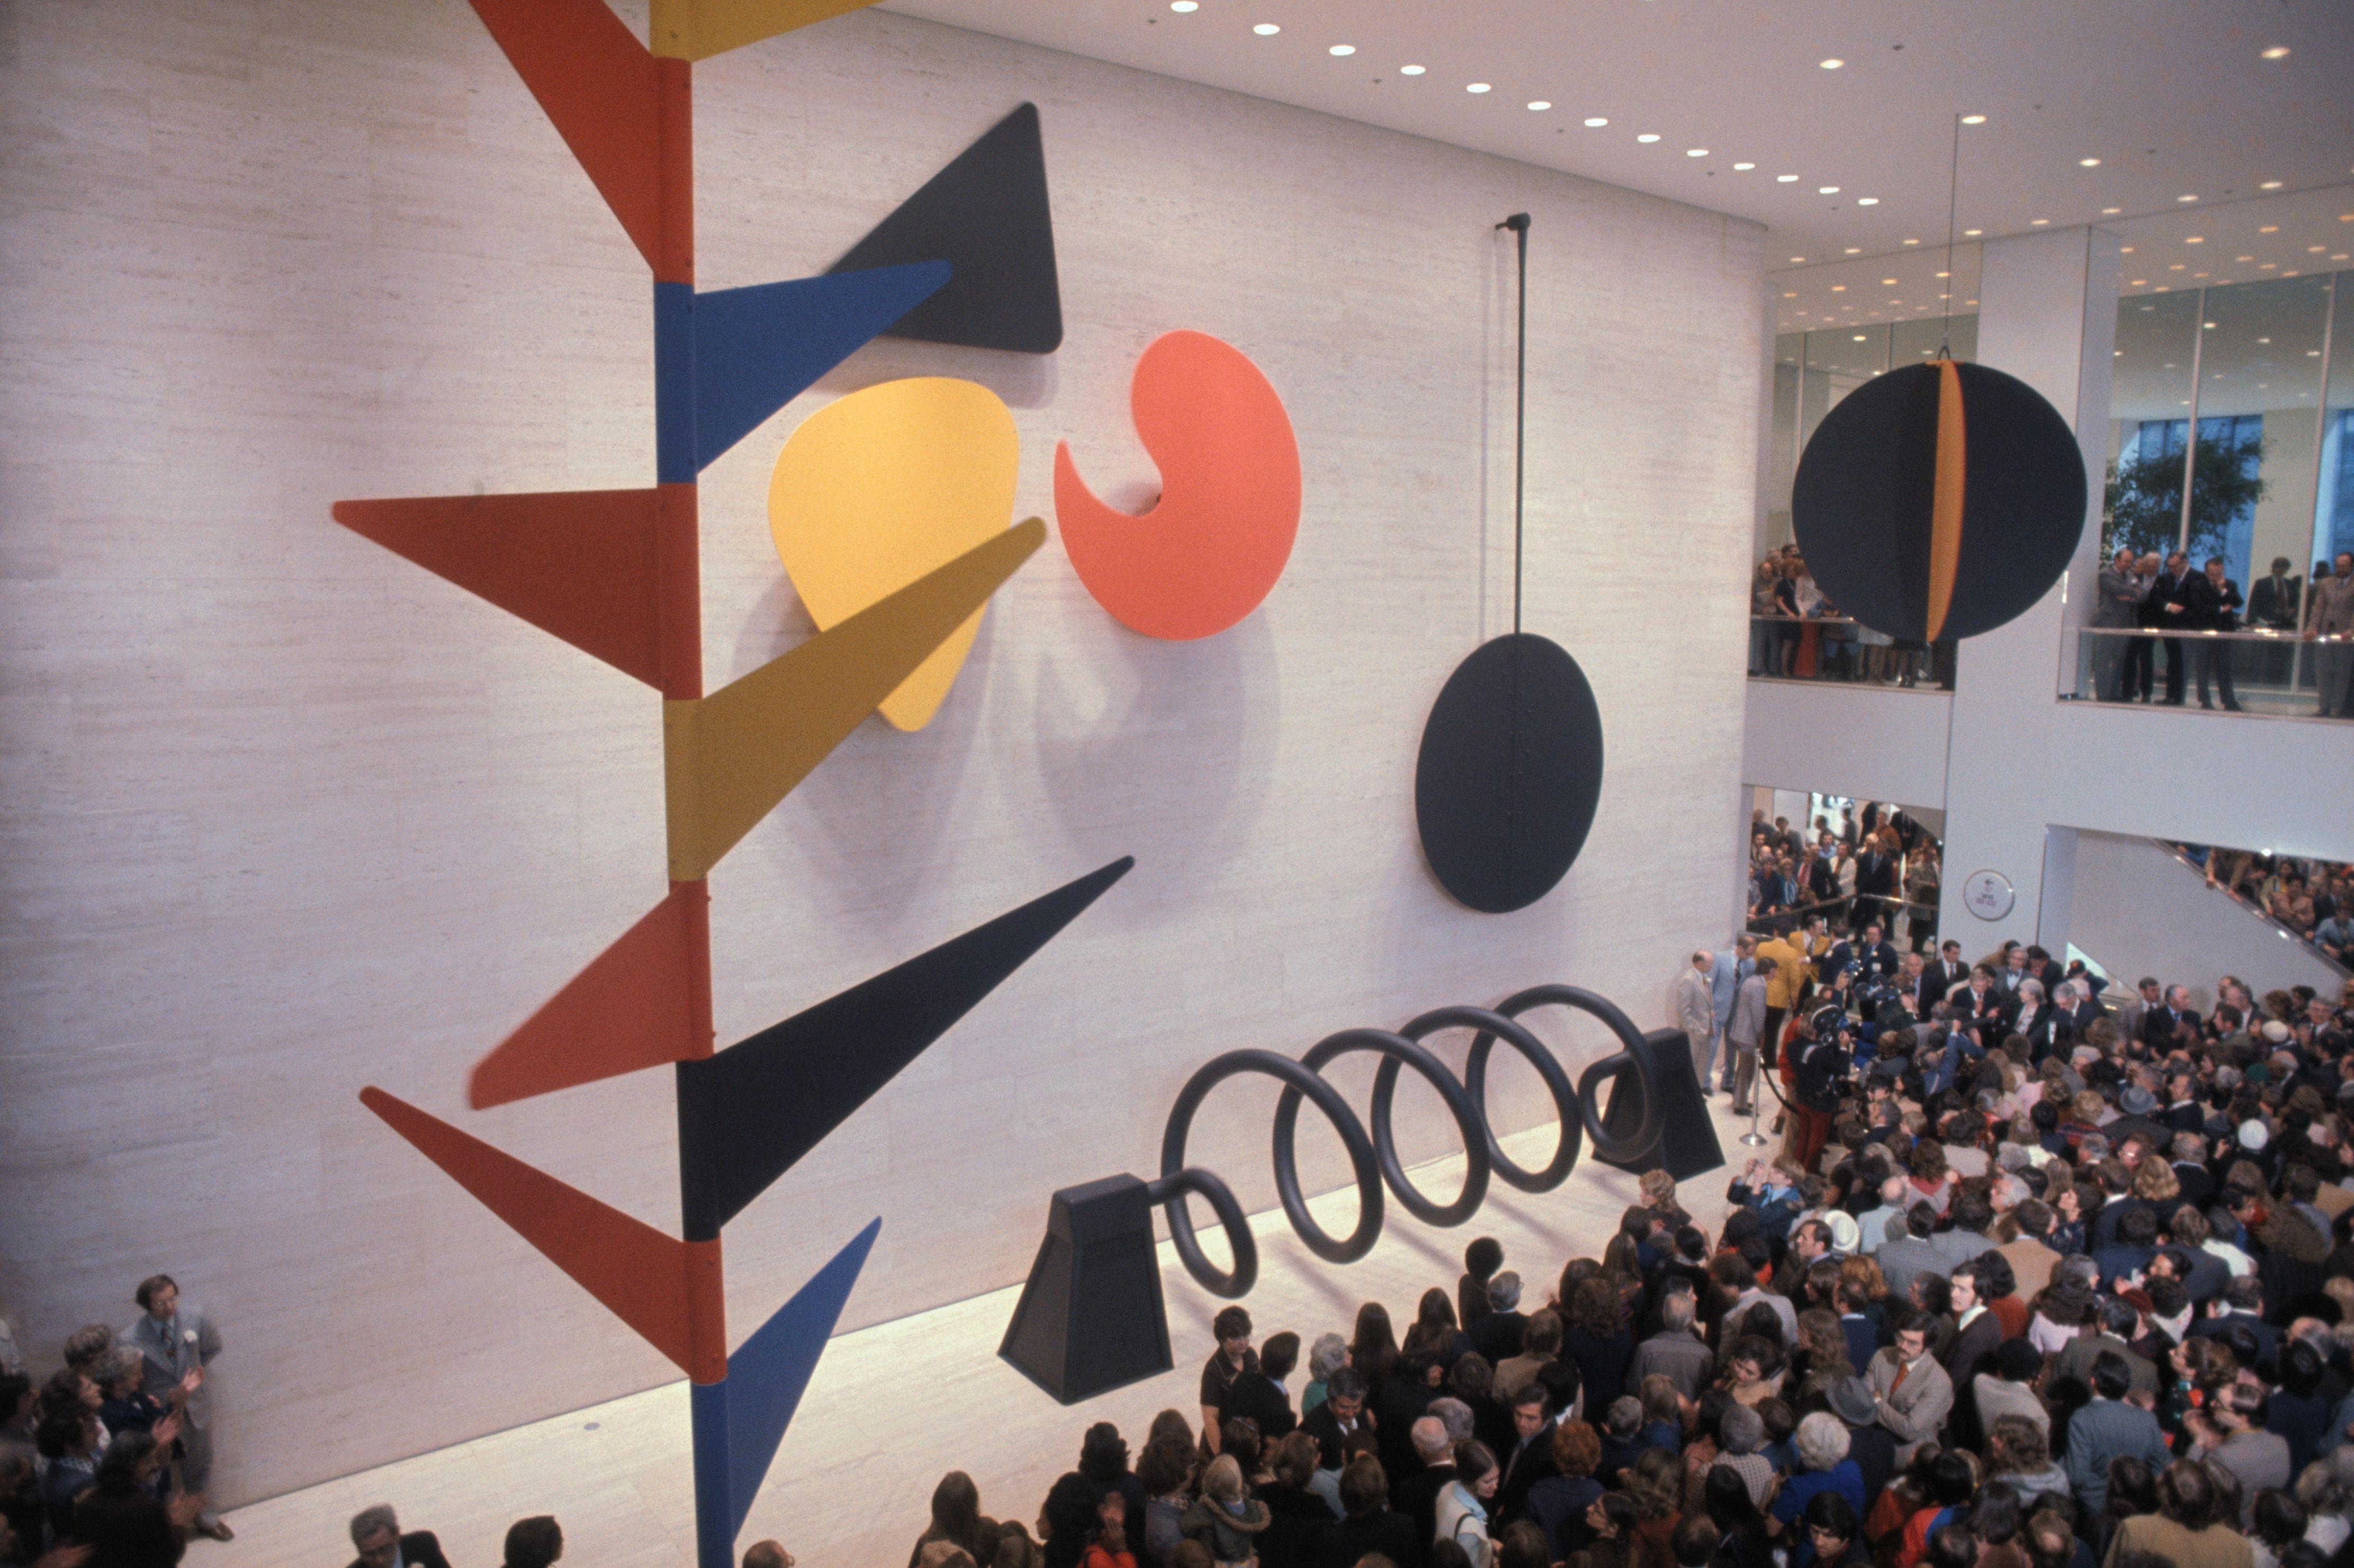 Moving Mural by Alexander Calder being dedicated